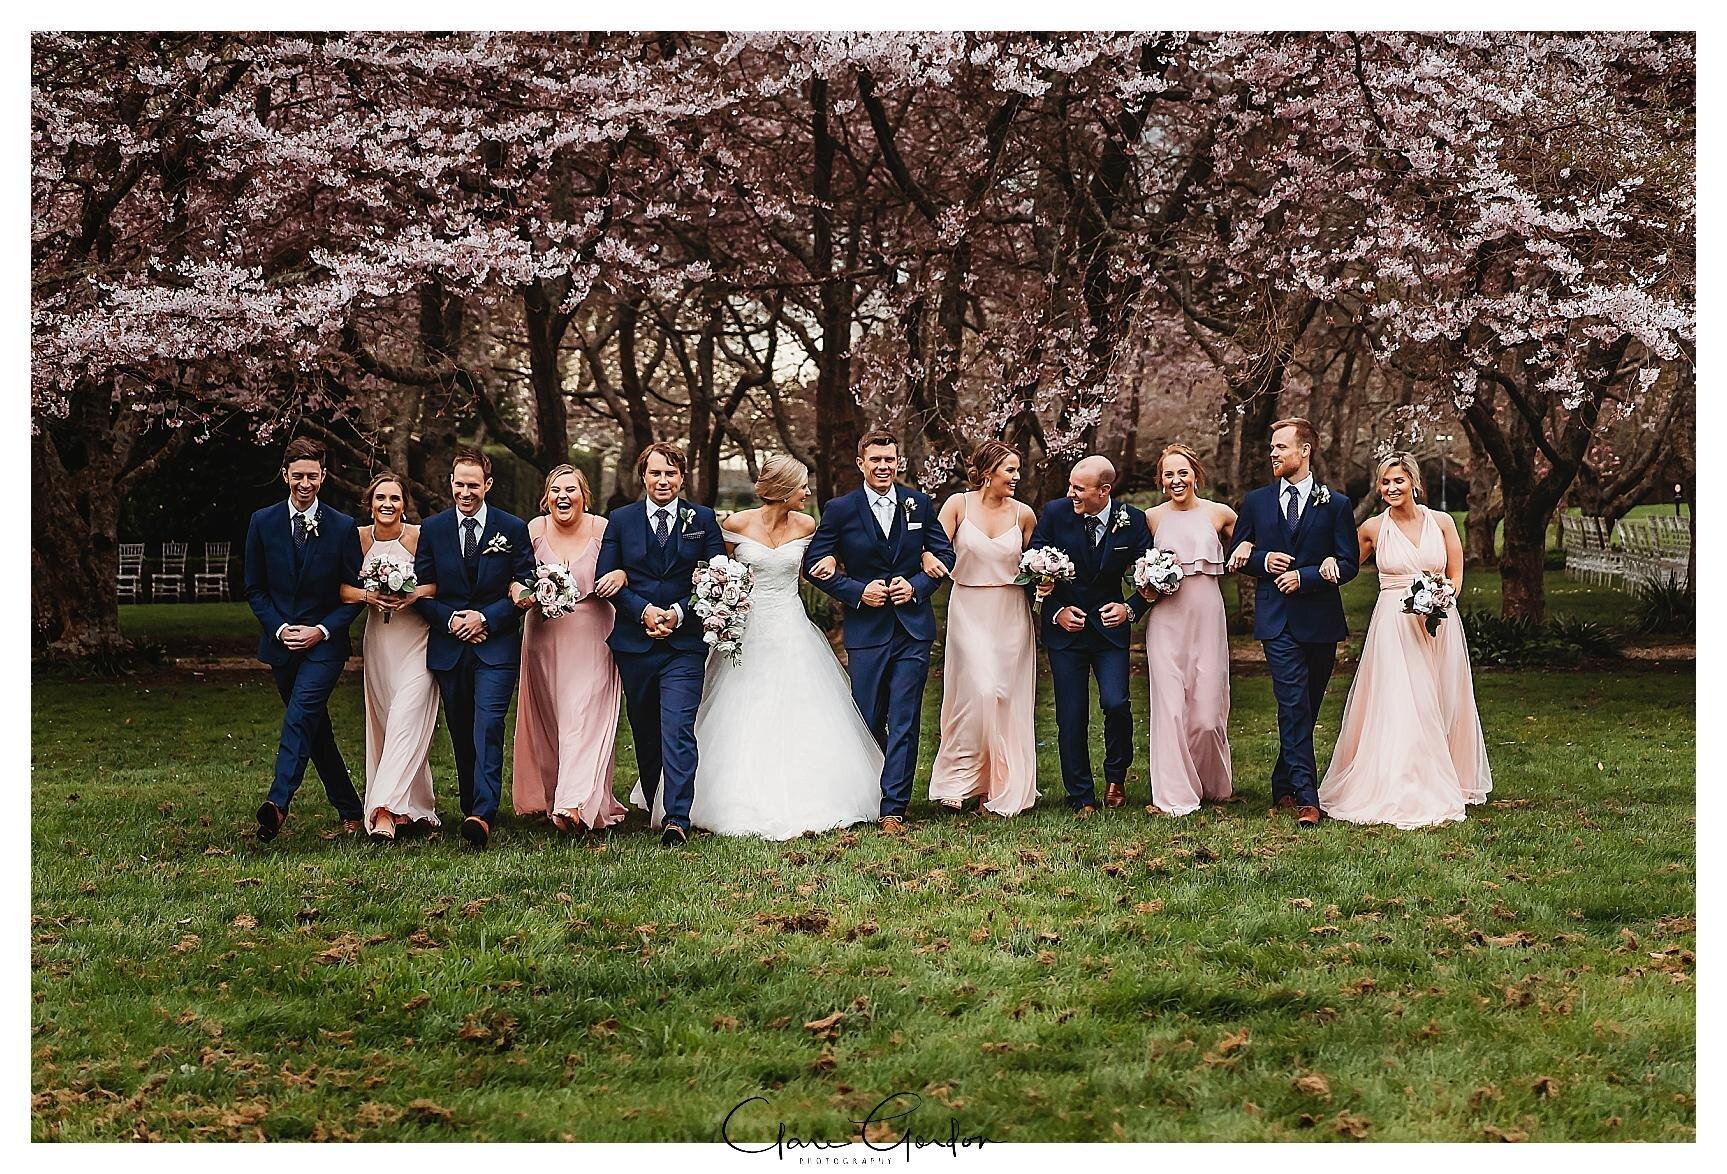 Henley-Hotel-Cherry-blossom-wedding-photos (61).jpg